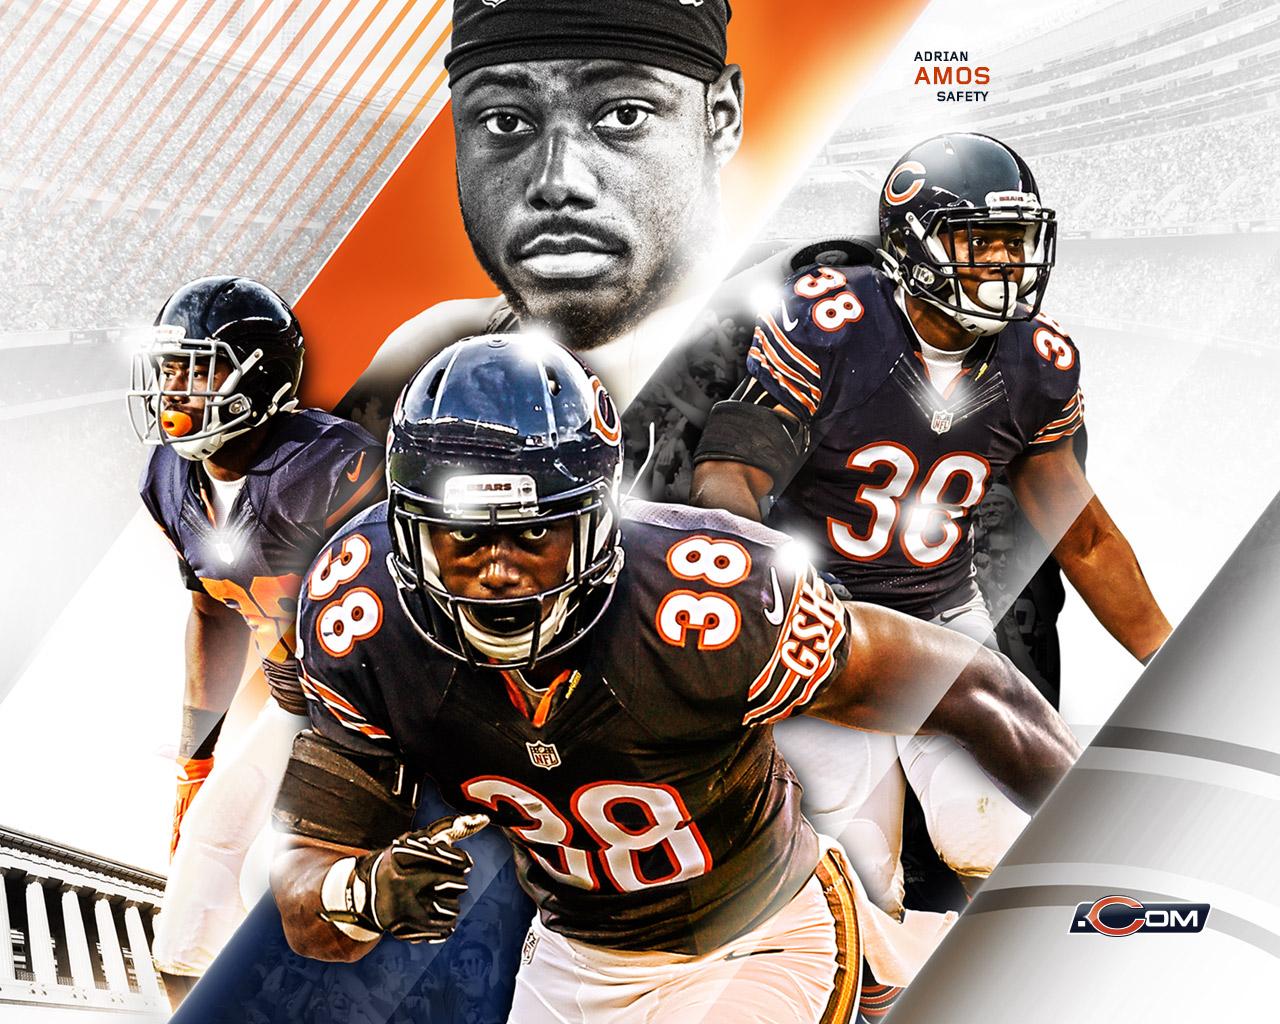 47+ Chicago Bears Wallpapers 1280x1024 on WallpaperSafari